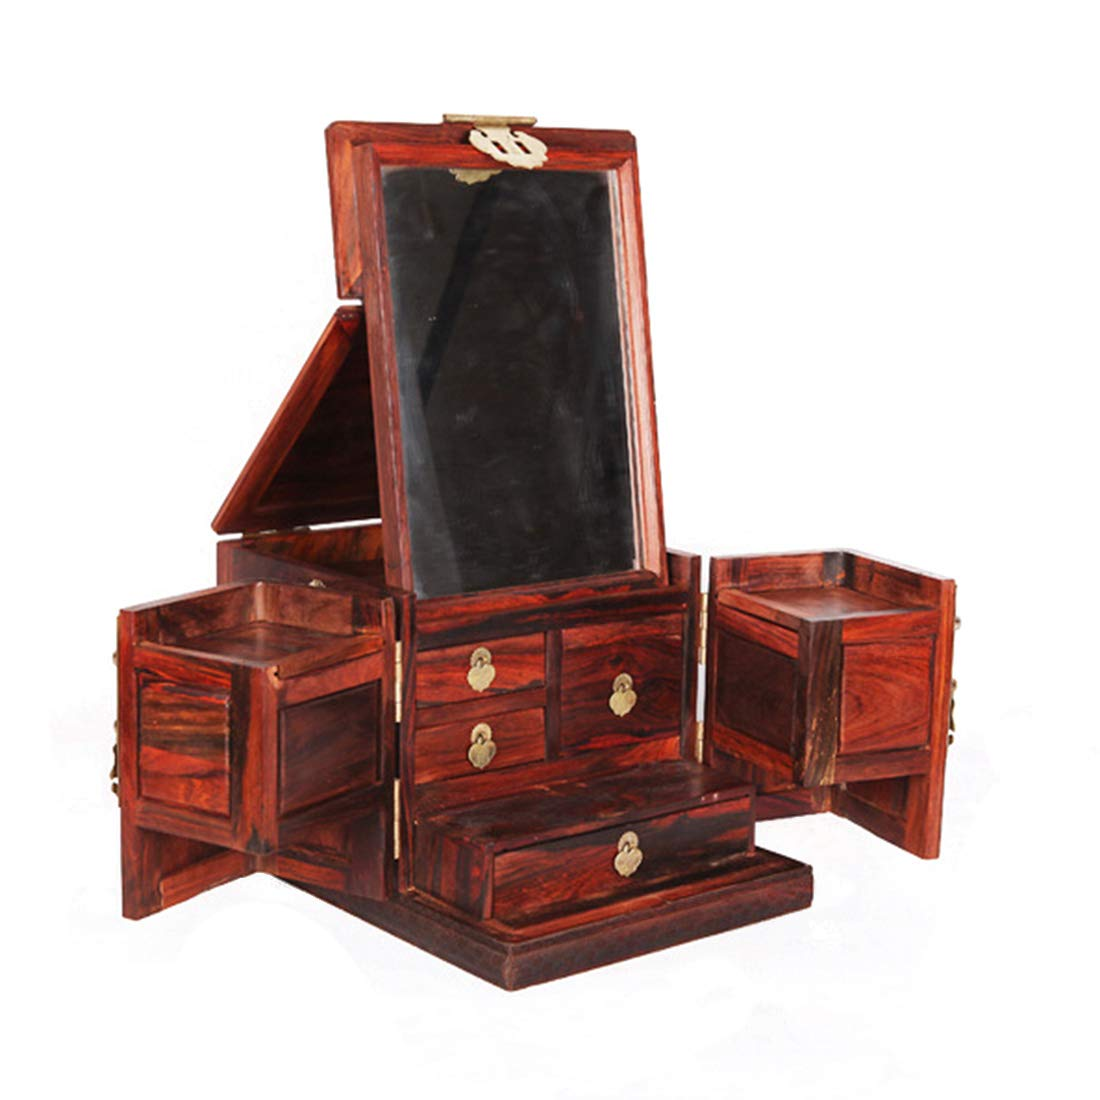 FELICIAAA 大規模な赤酸ブランチパールボックス木製の棺ジュエリーボックスミラーボックス (Color : Wood) B07NW65DW5 Wood